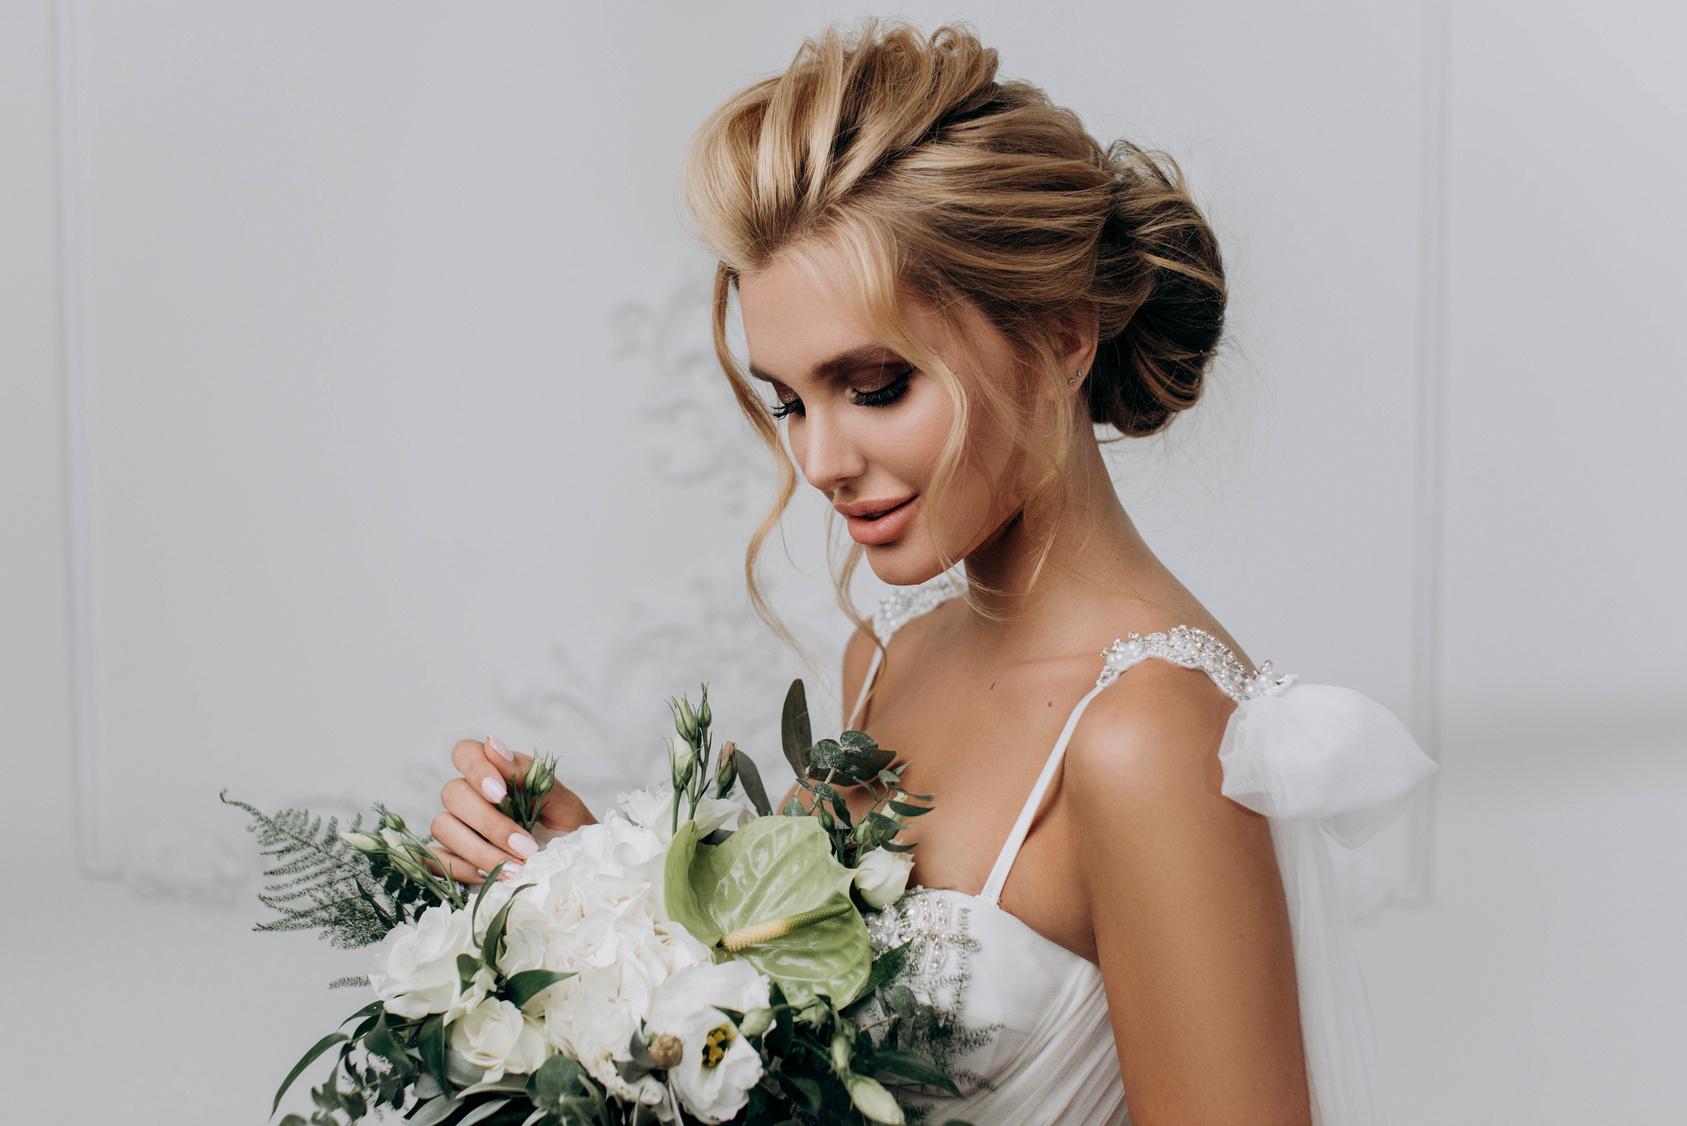 Eleganckie Fryzury ślubne Planujemywesele